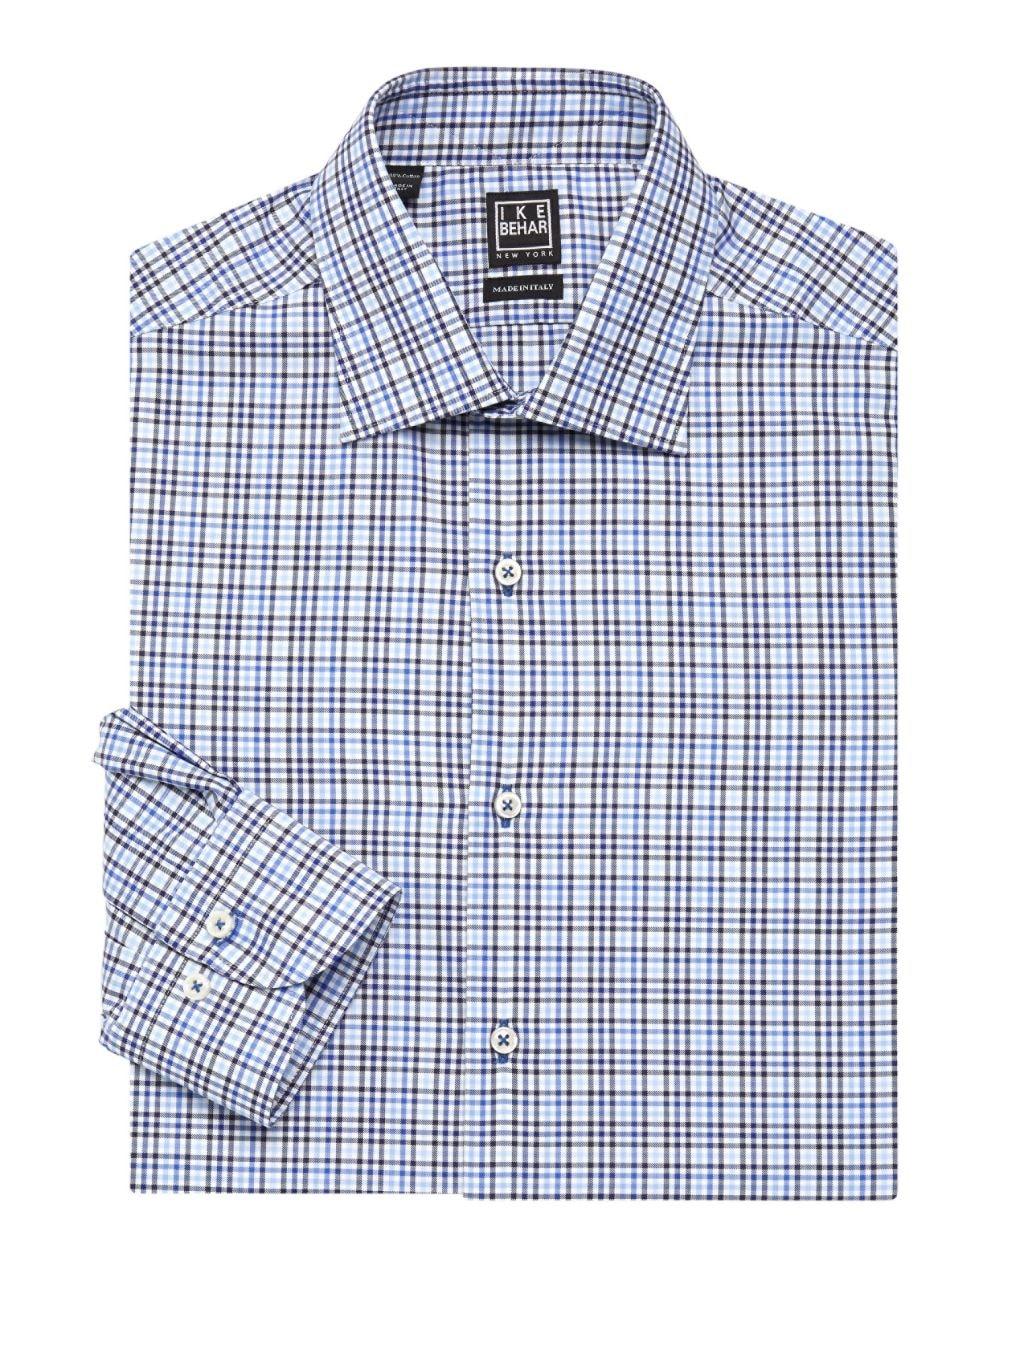 IKE by Ike Behar Check Dress Shirt